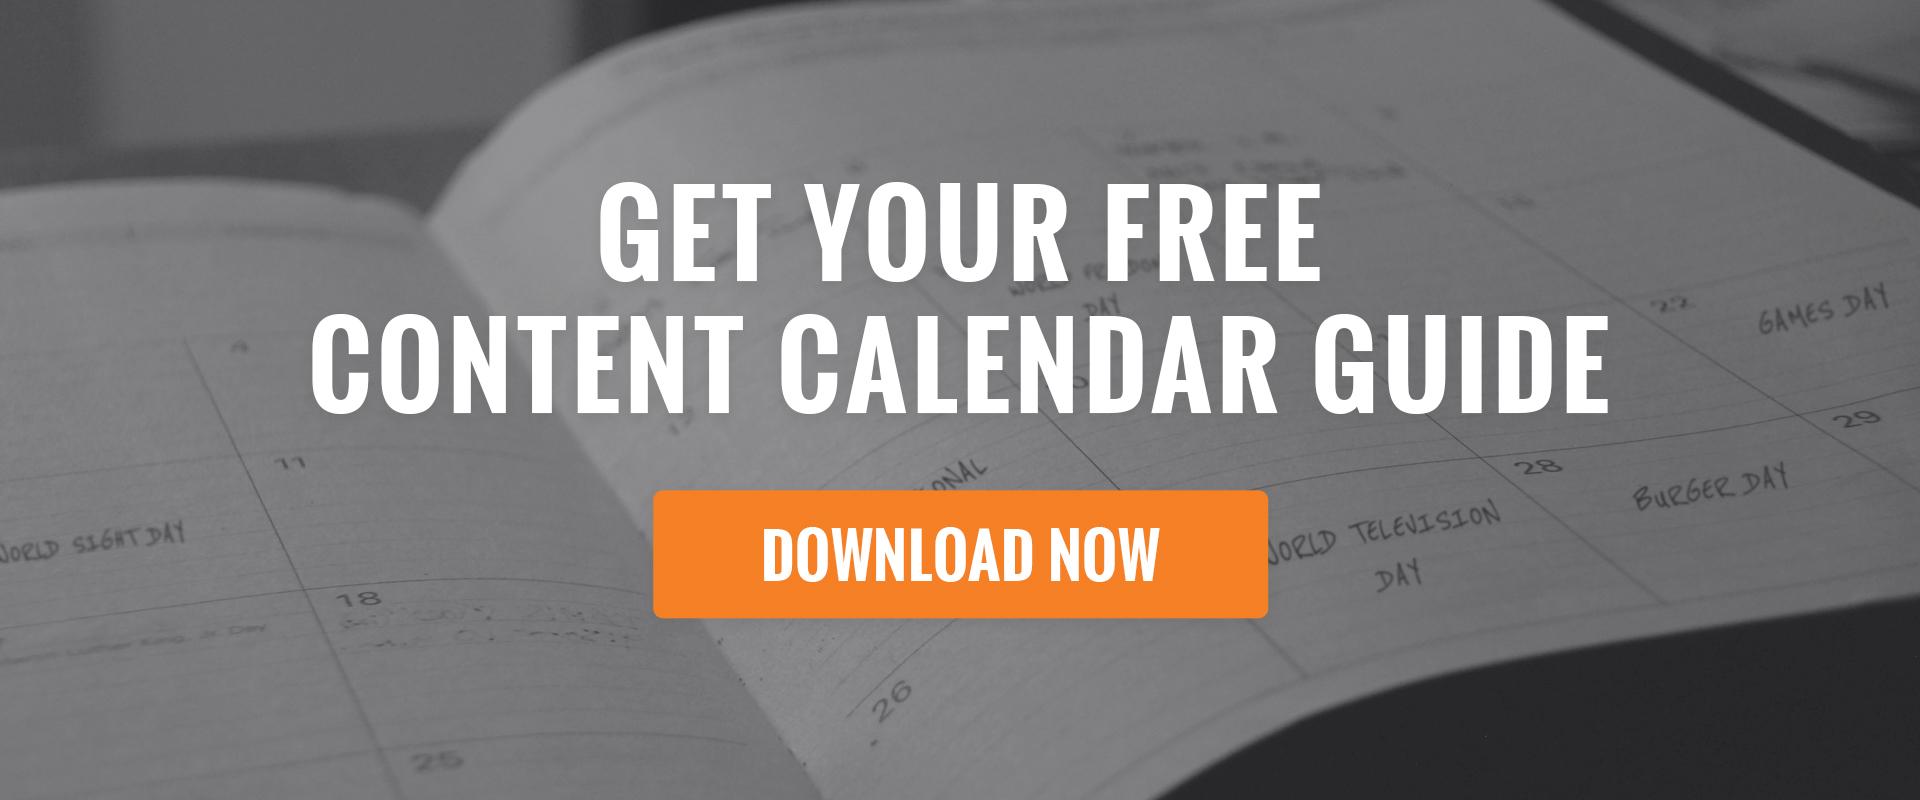 Content_Calendar_Guide_CTA_Image-1